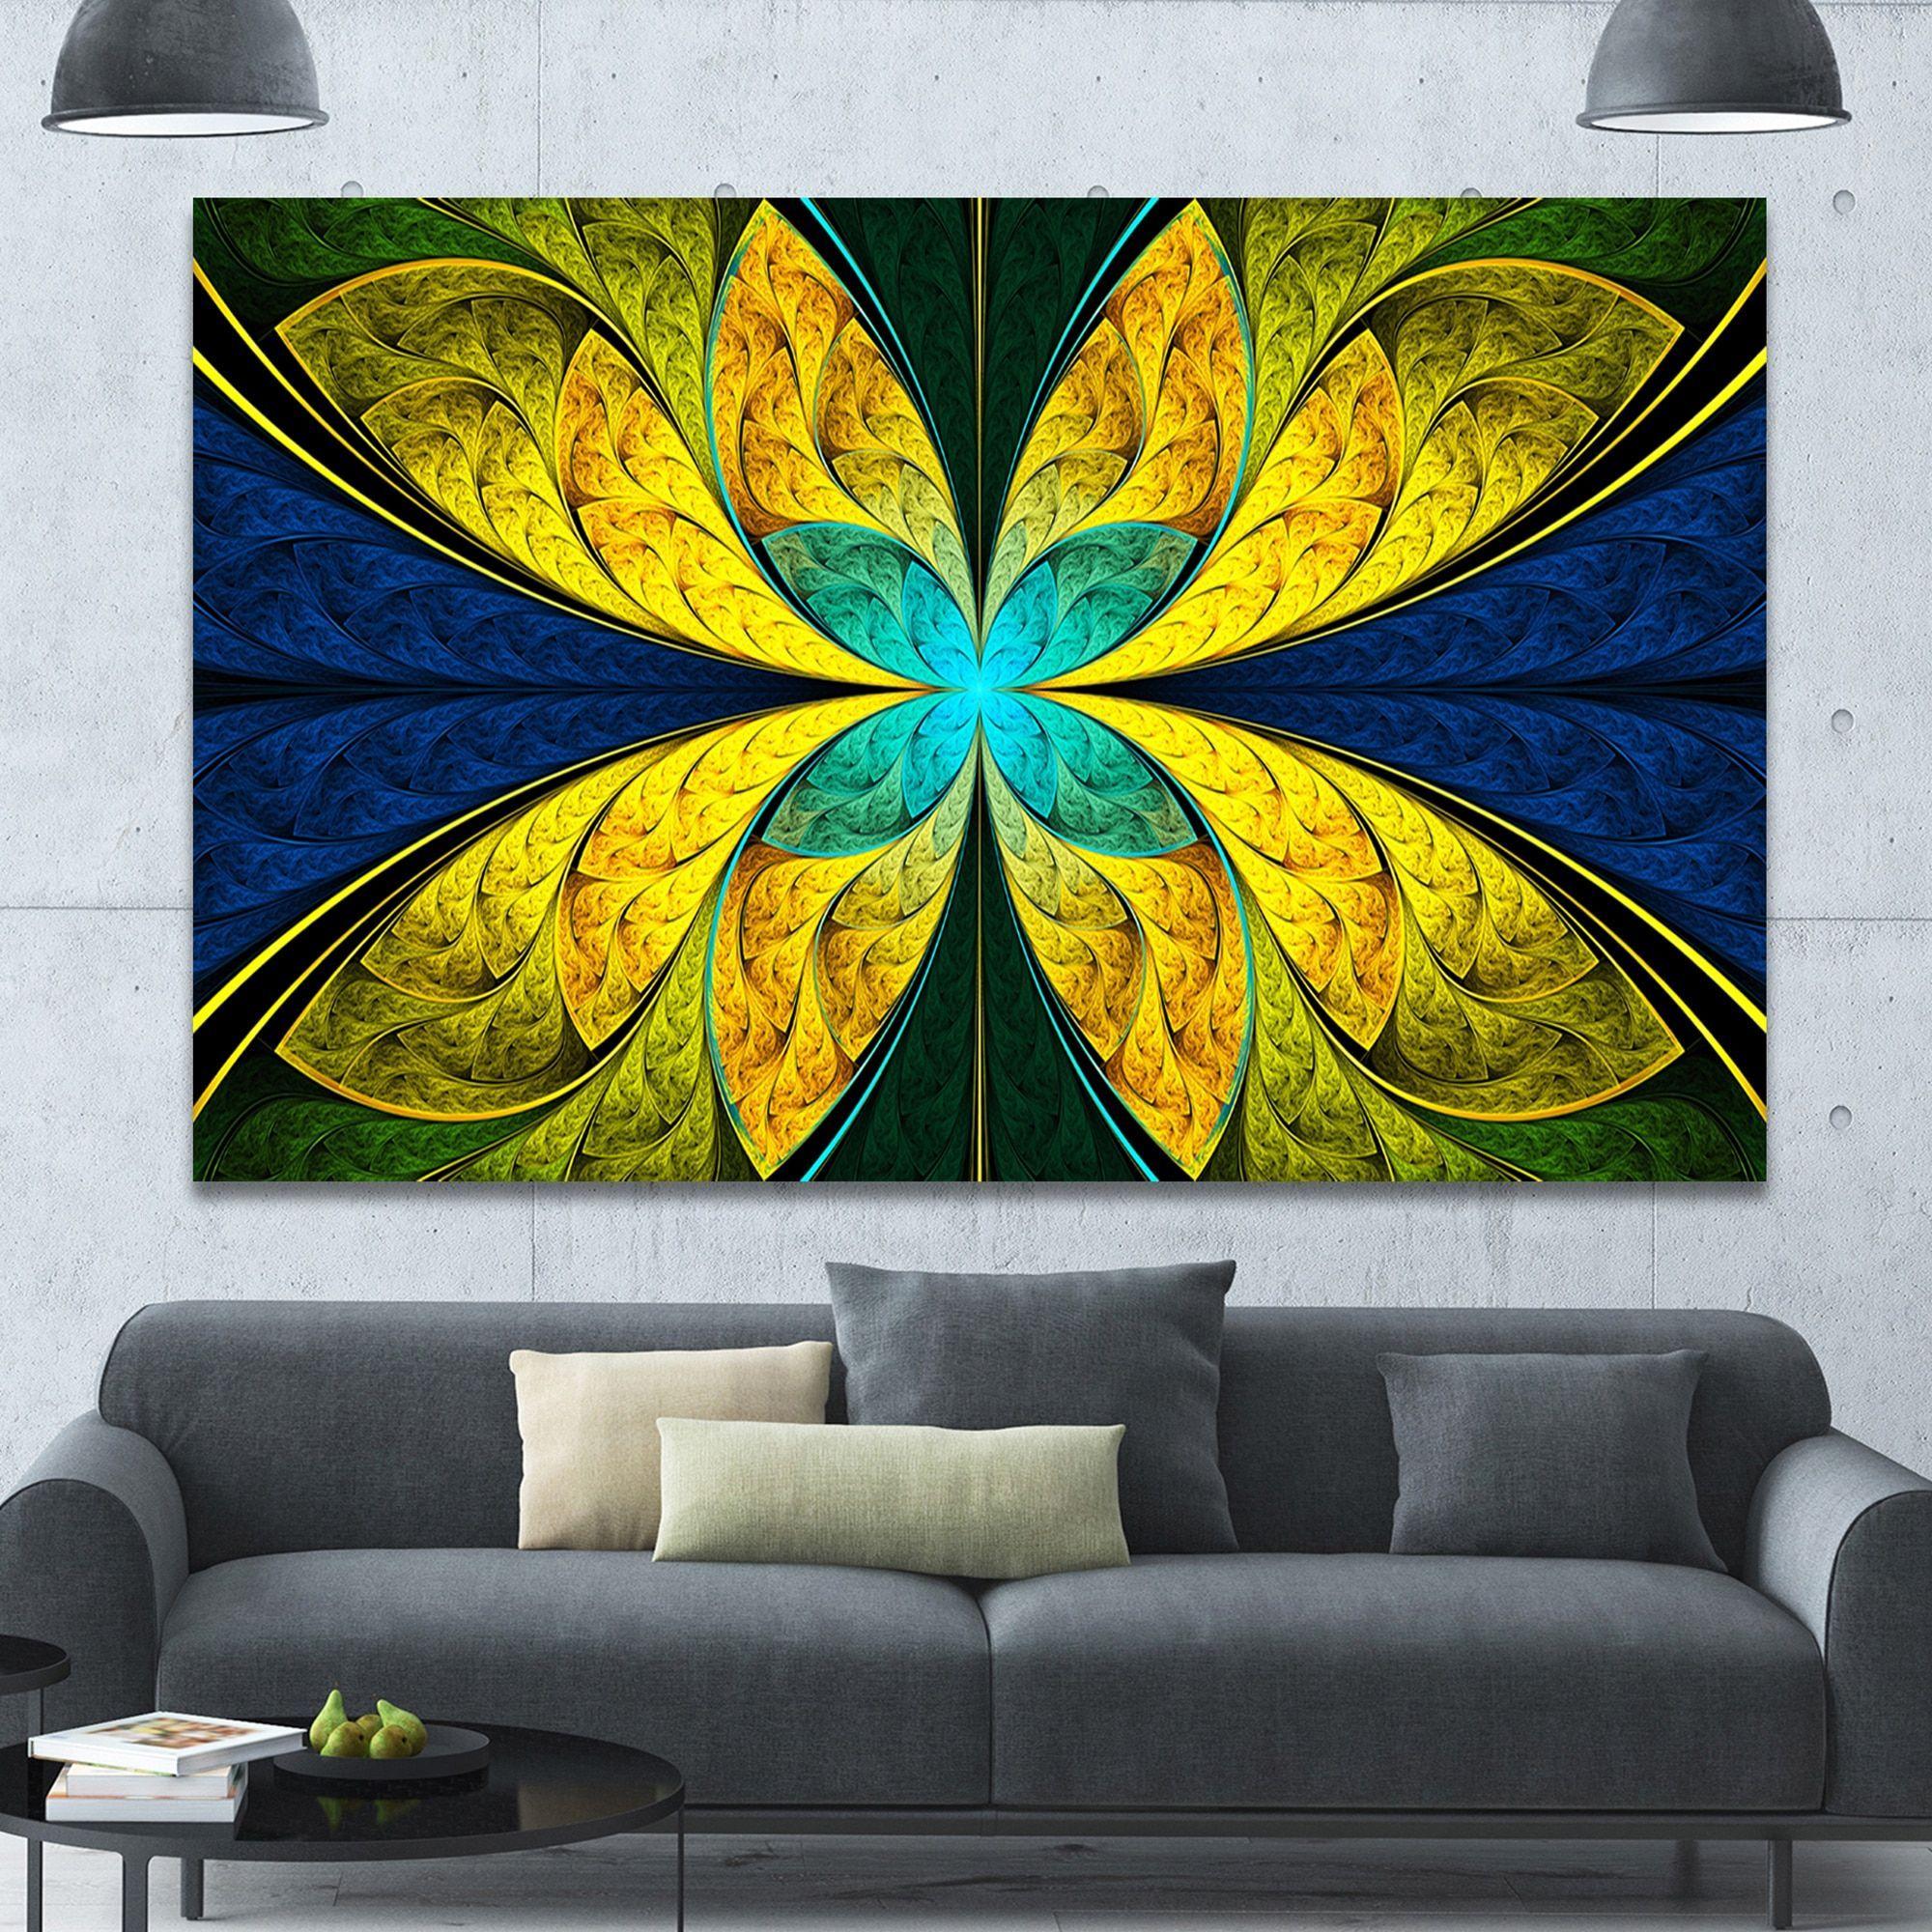 Designart ubright blue fractal floweru extra floral wall art on